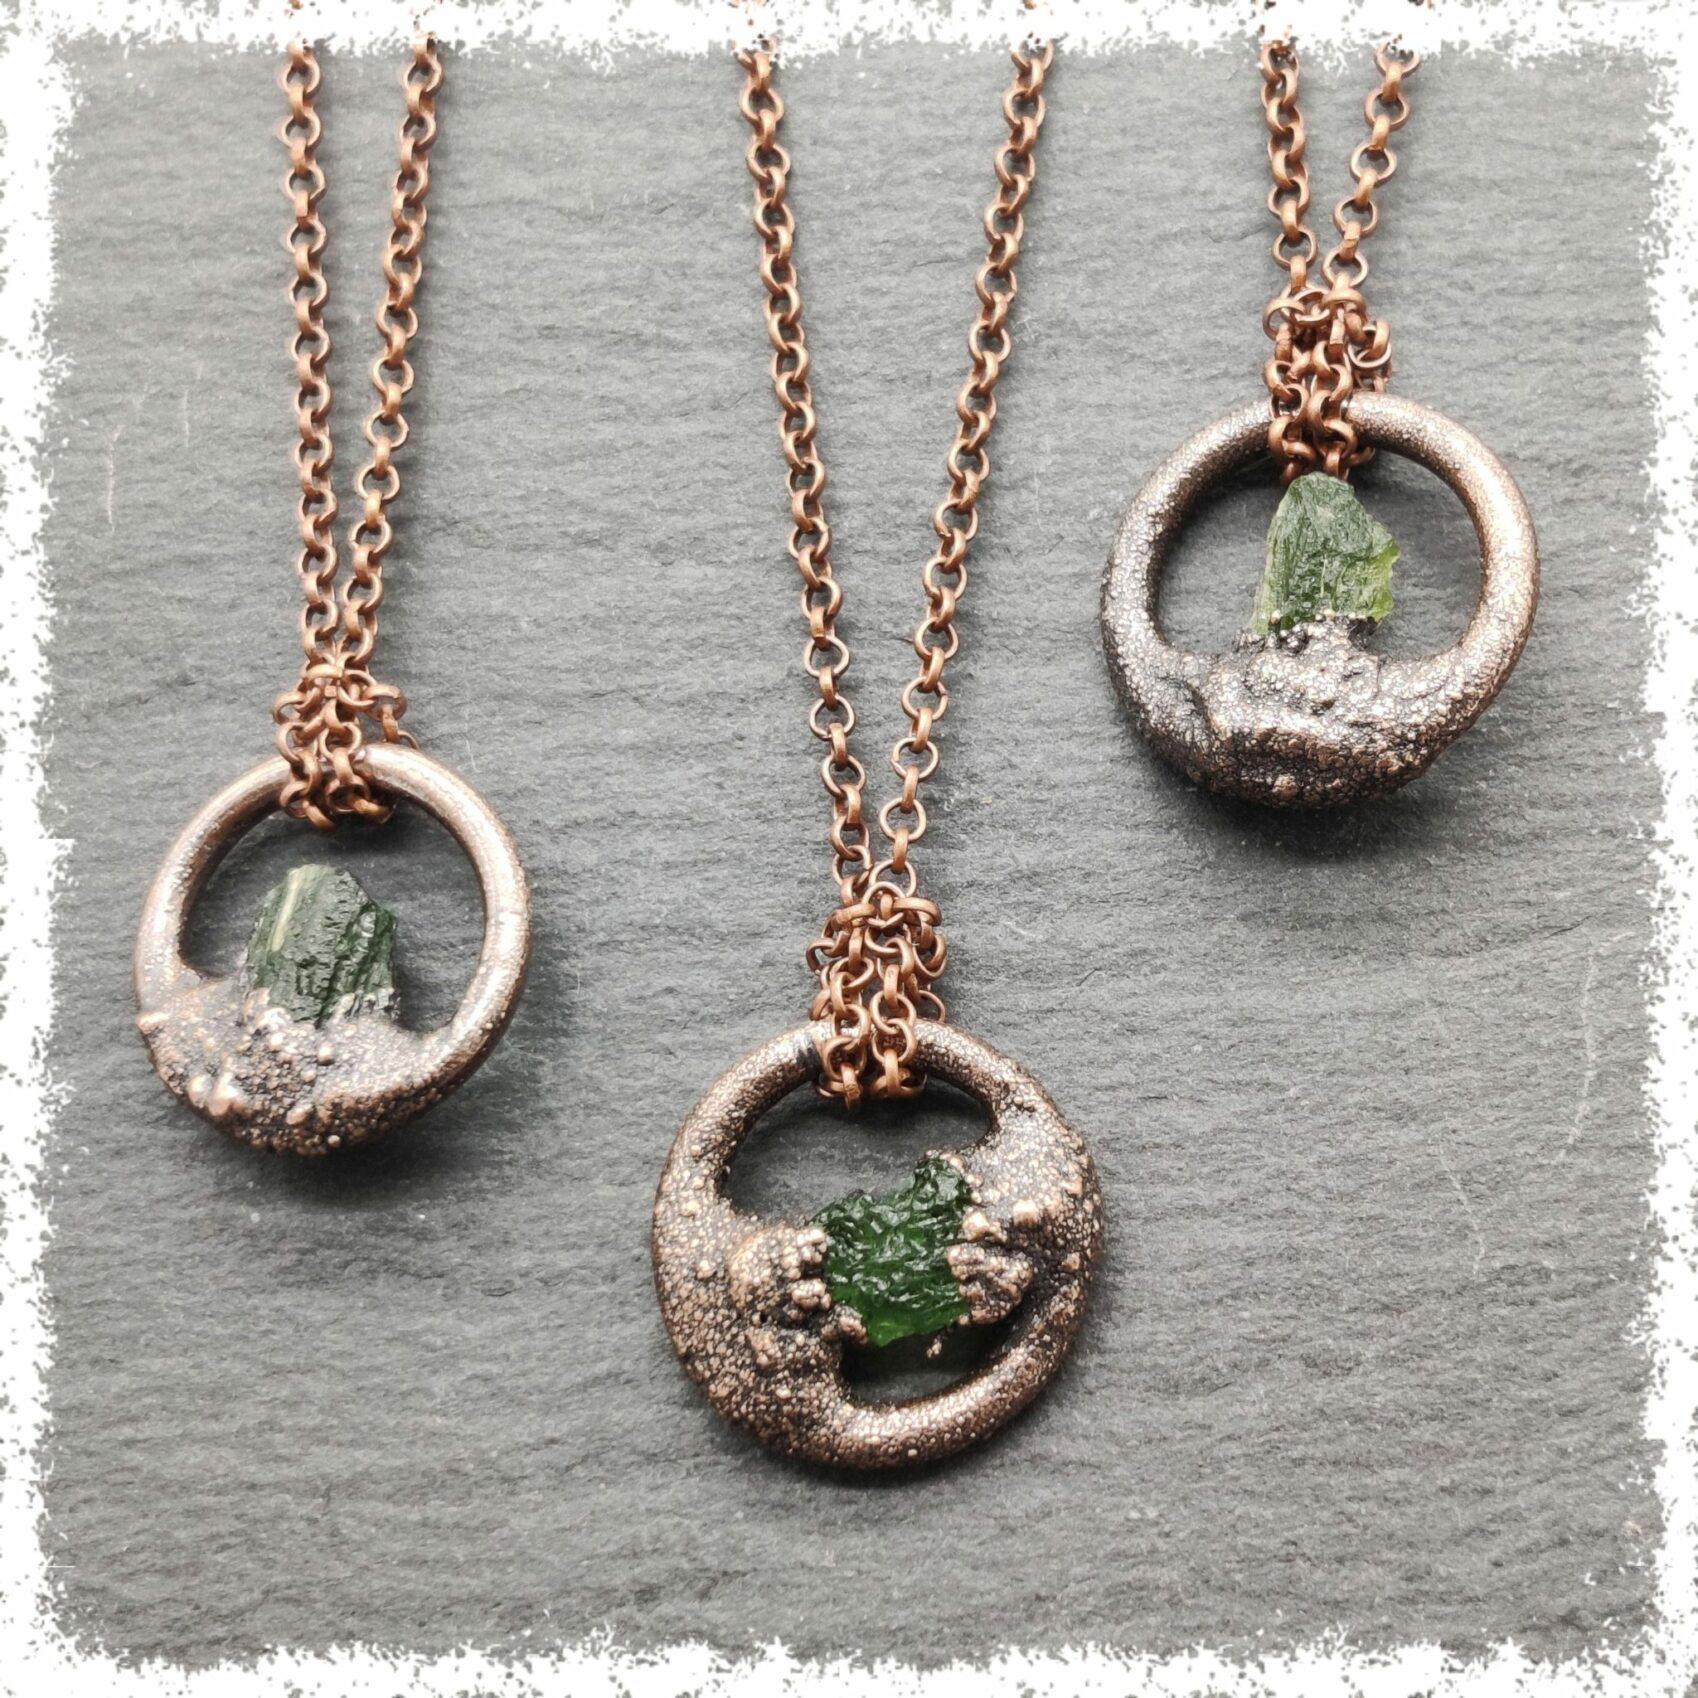 citrine gemstone in copper pendant on chain